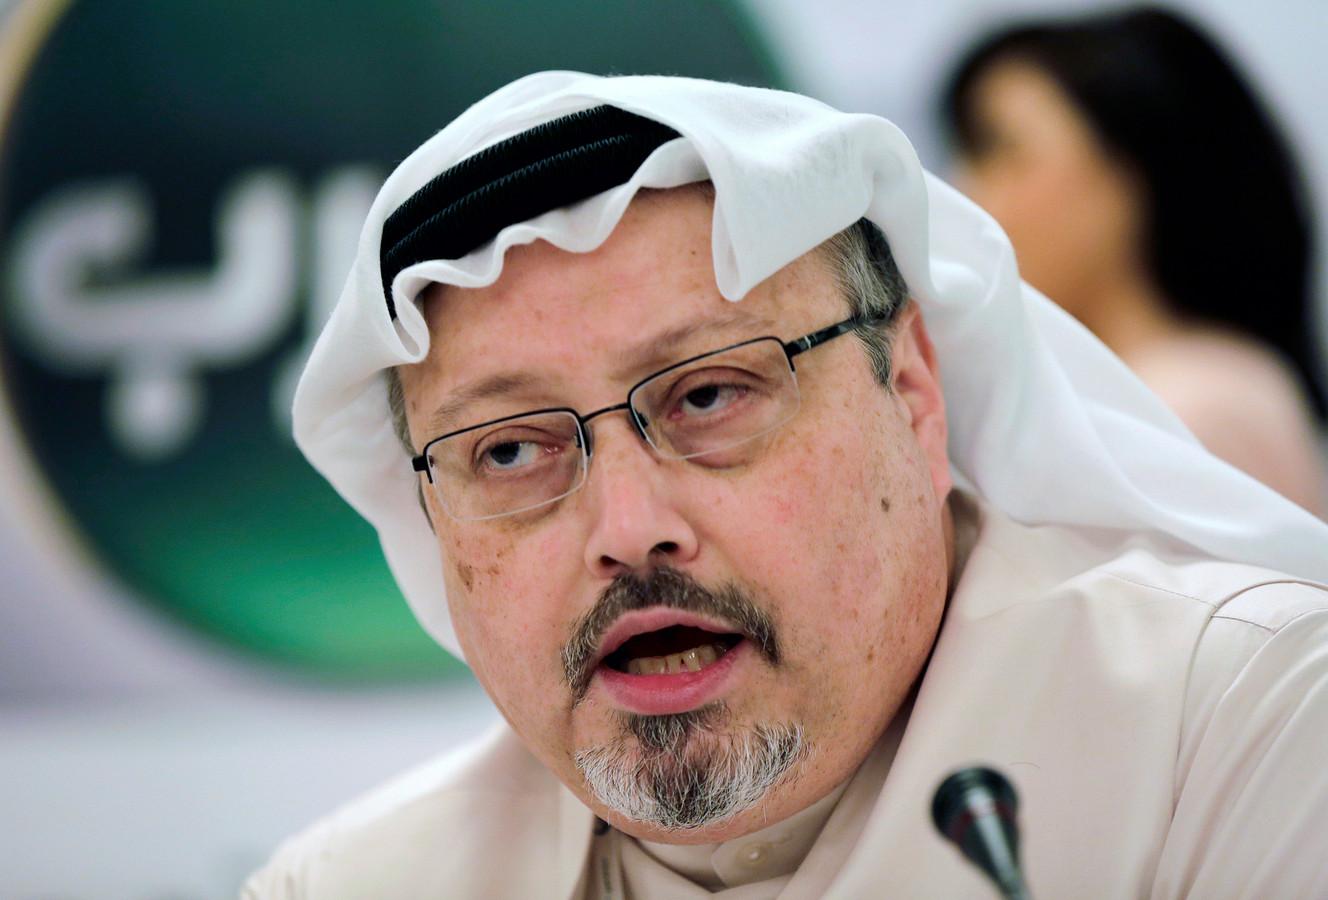 Jamal Khashoggi schreef regelmatig kritisch over Saoedi-Arabië.